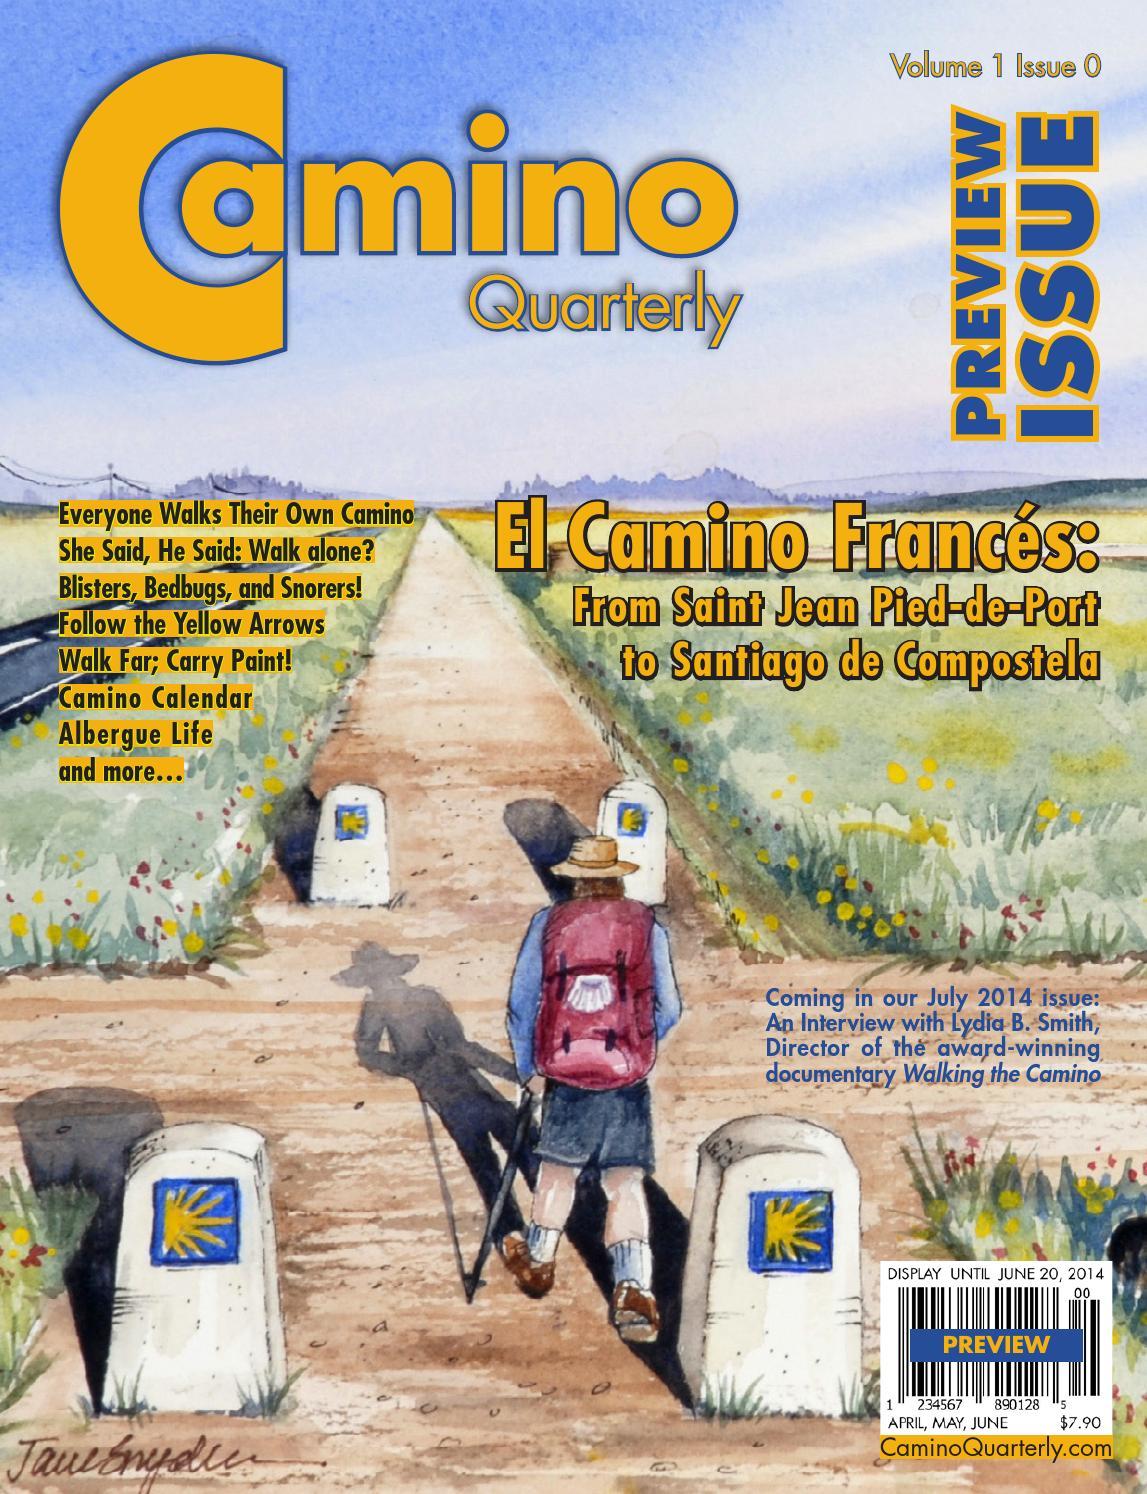 Camino quarterly preview by caminoquarterly issuu - St jean pied de port to santiago distance ...